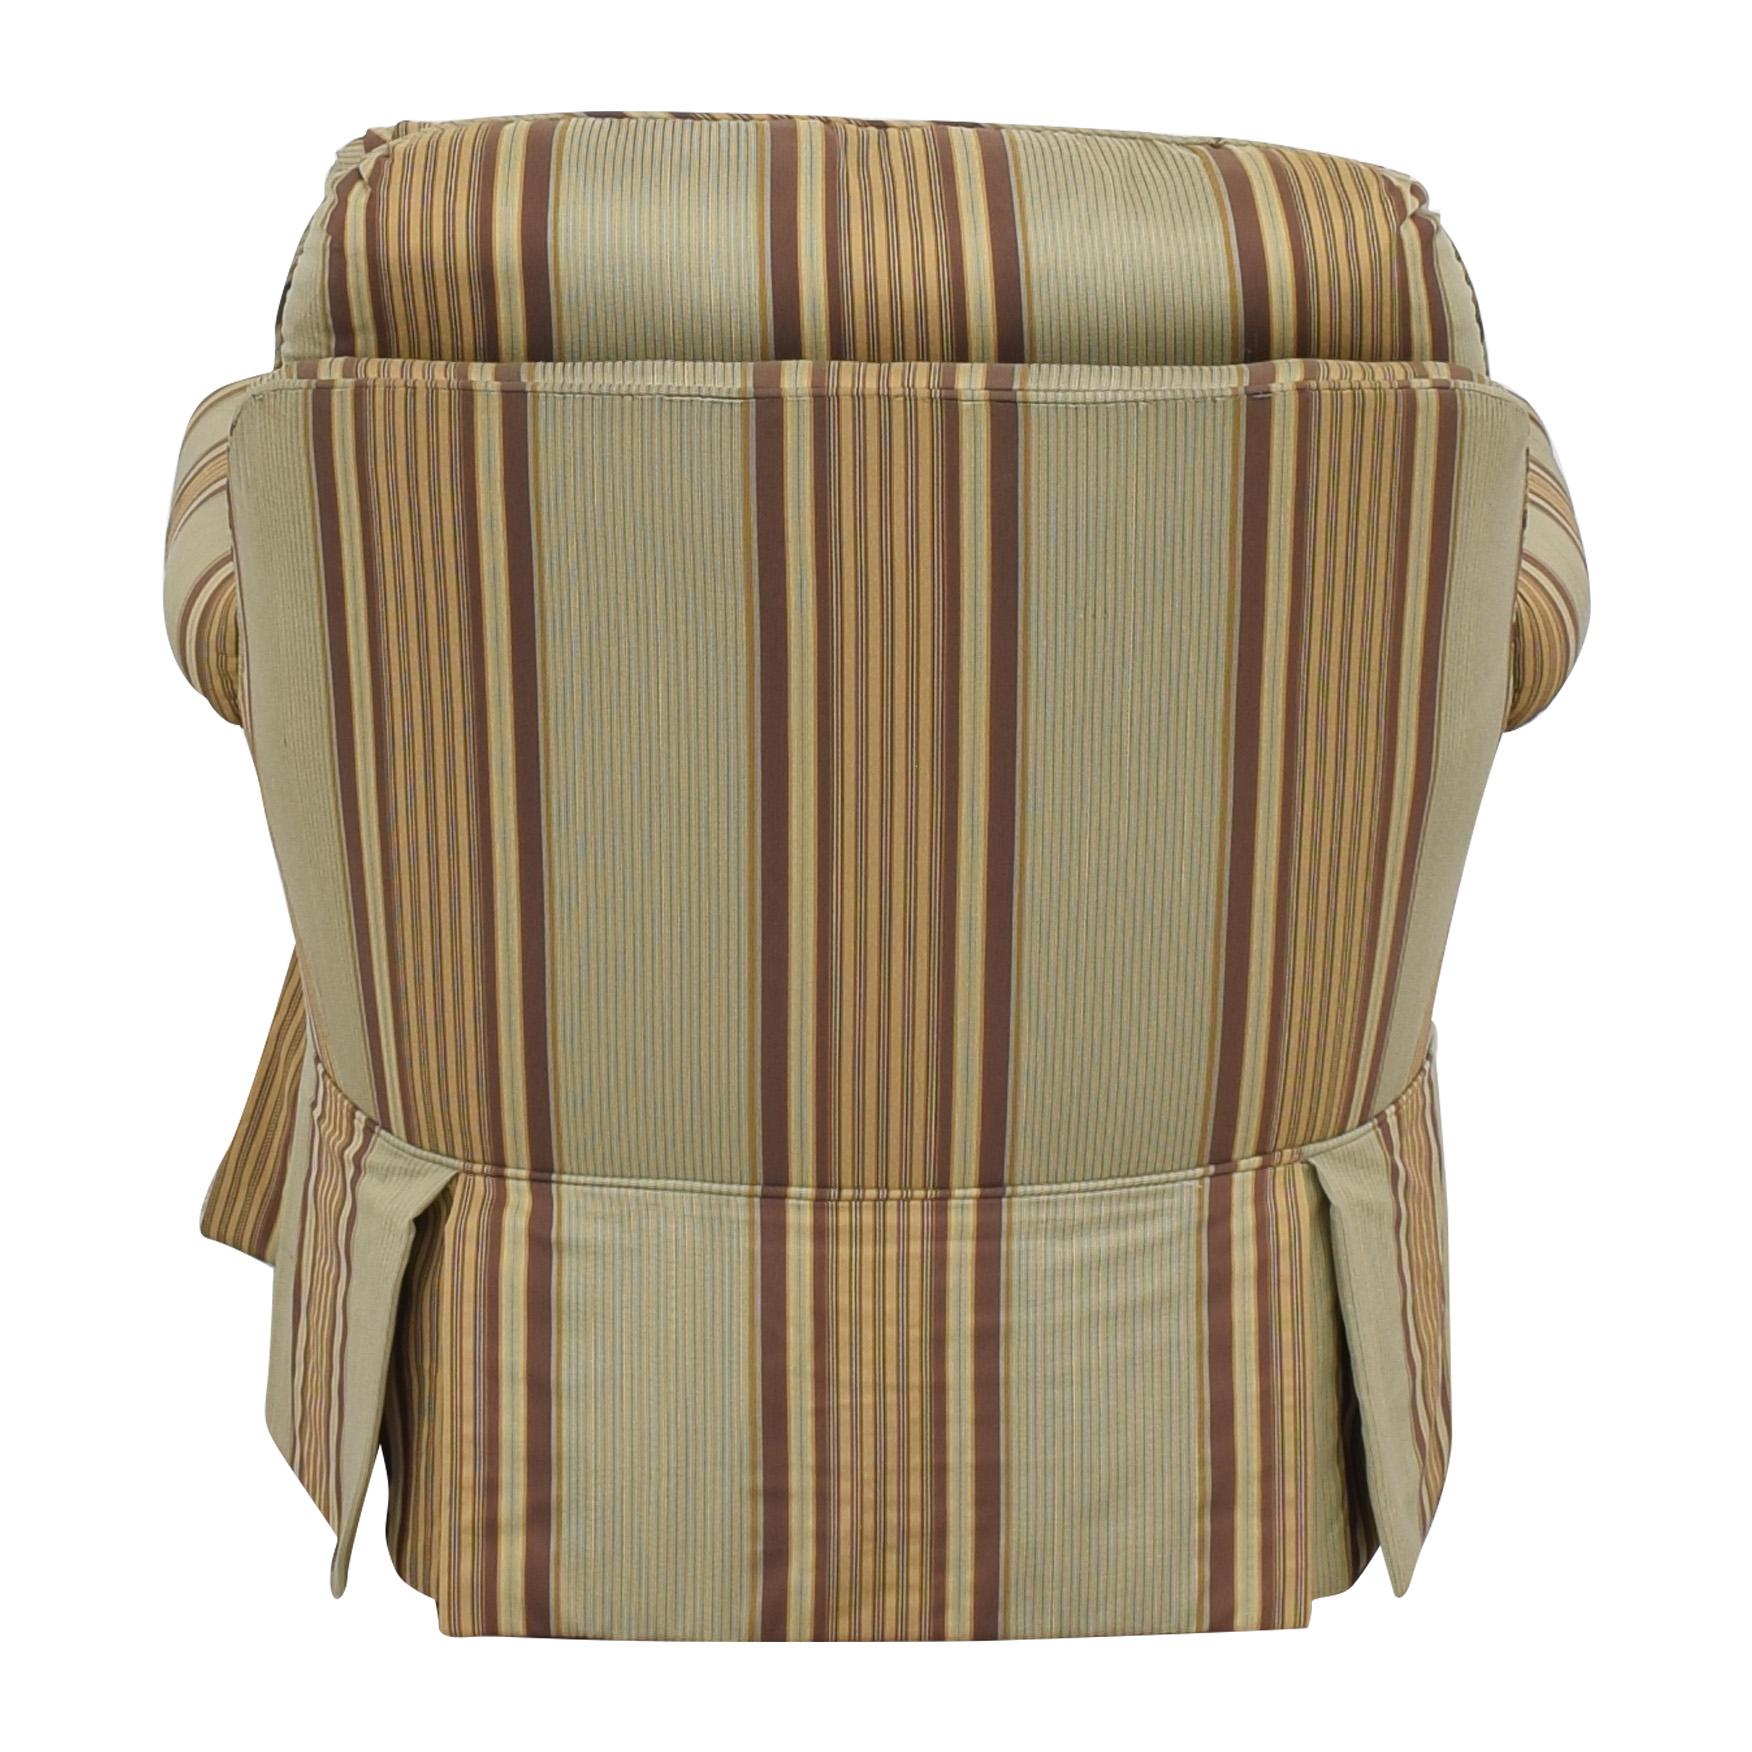 Harden Harden Roll Arm Lounge Chair on sale